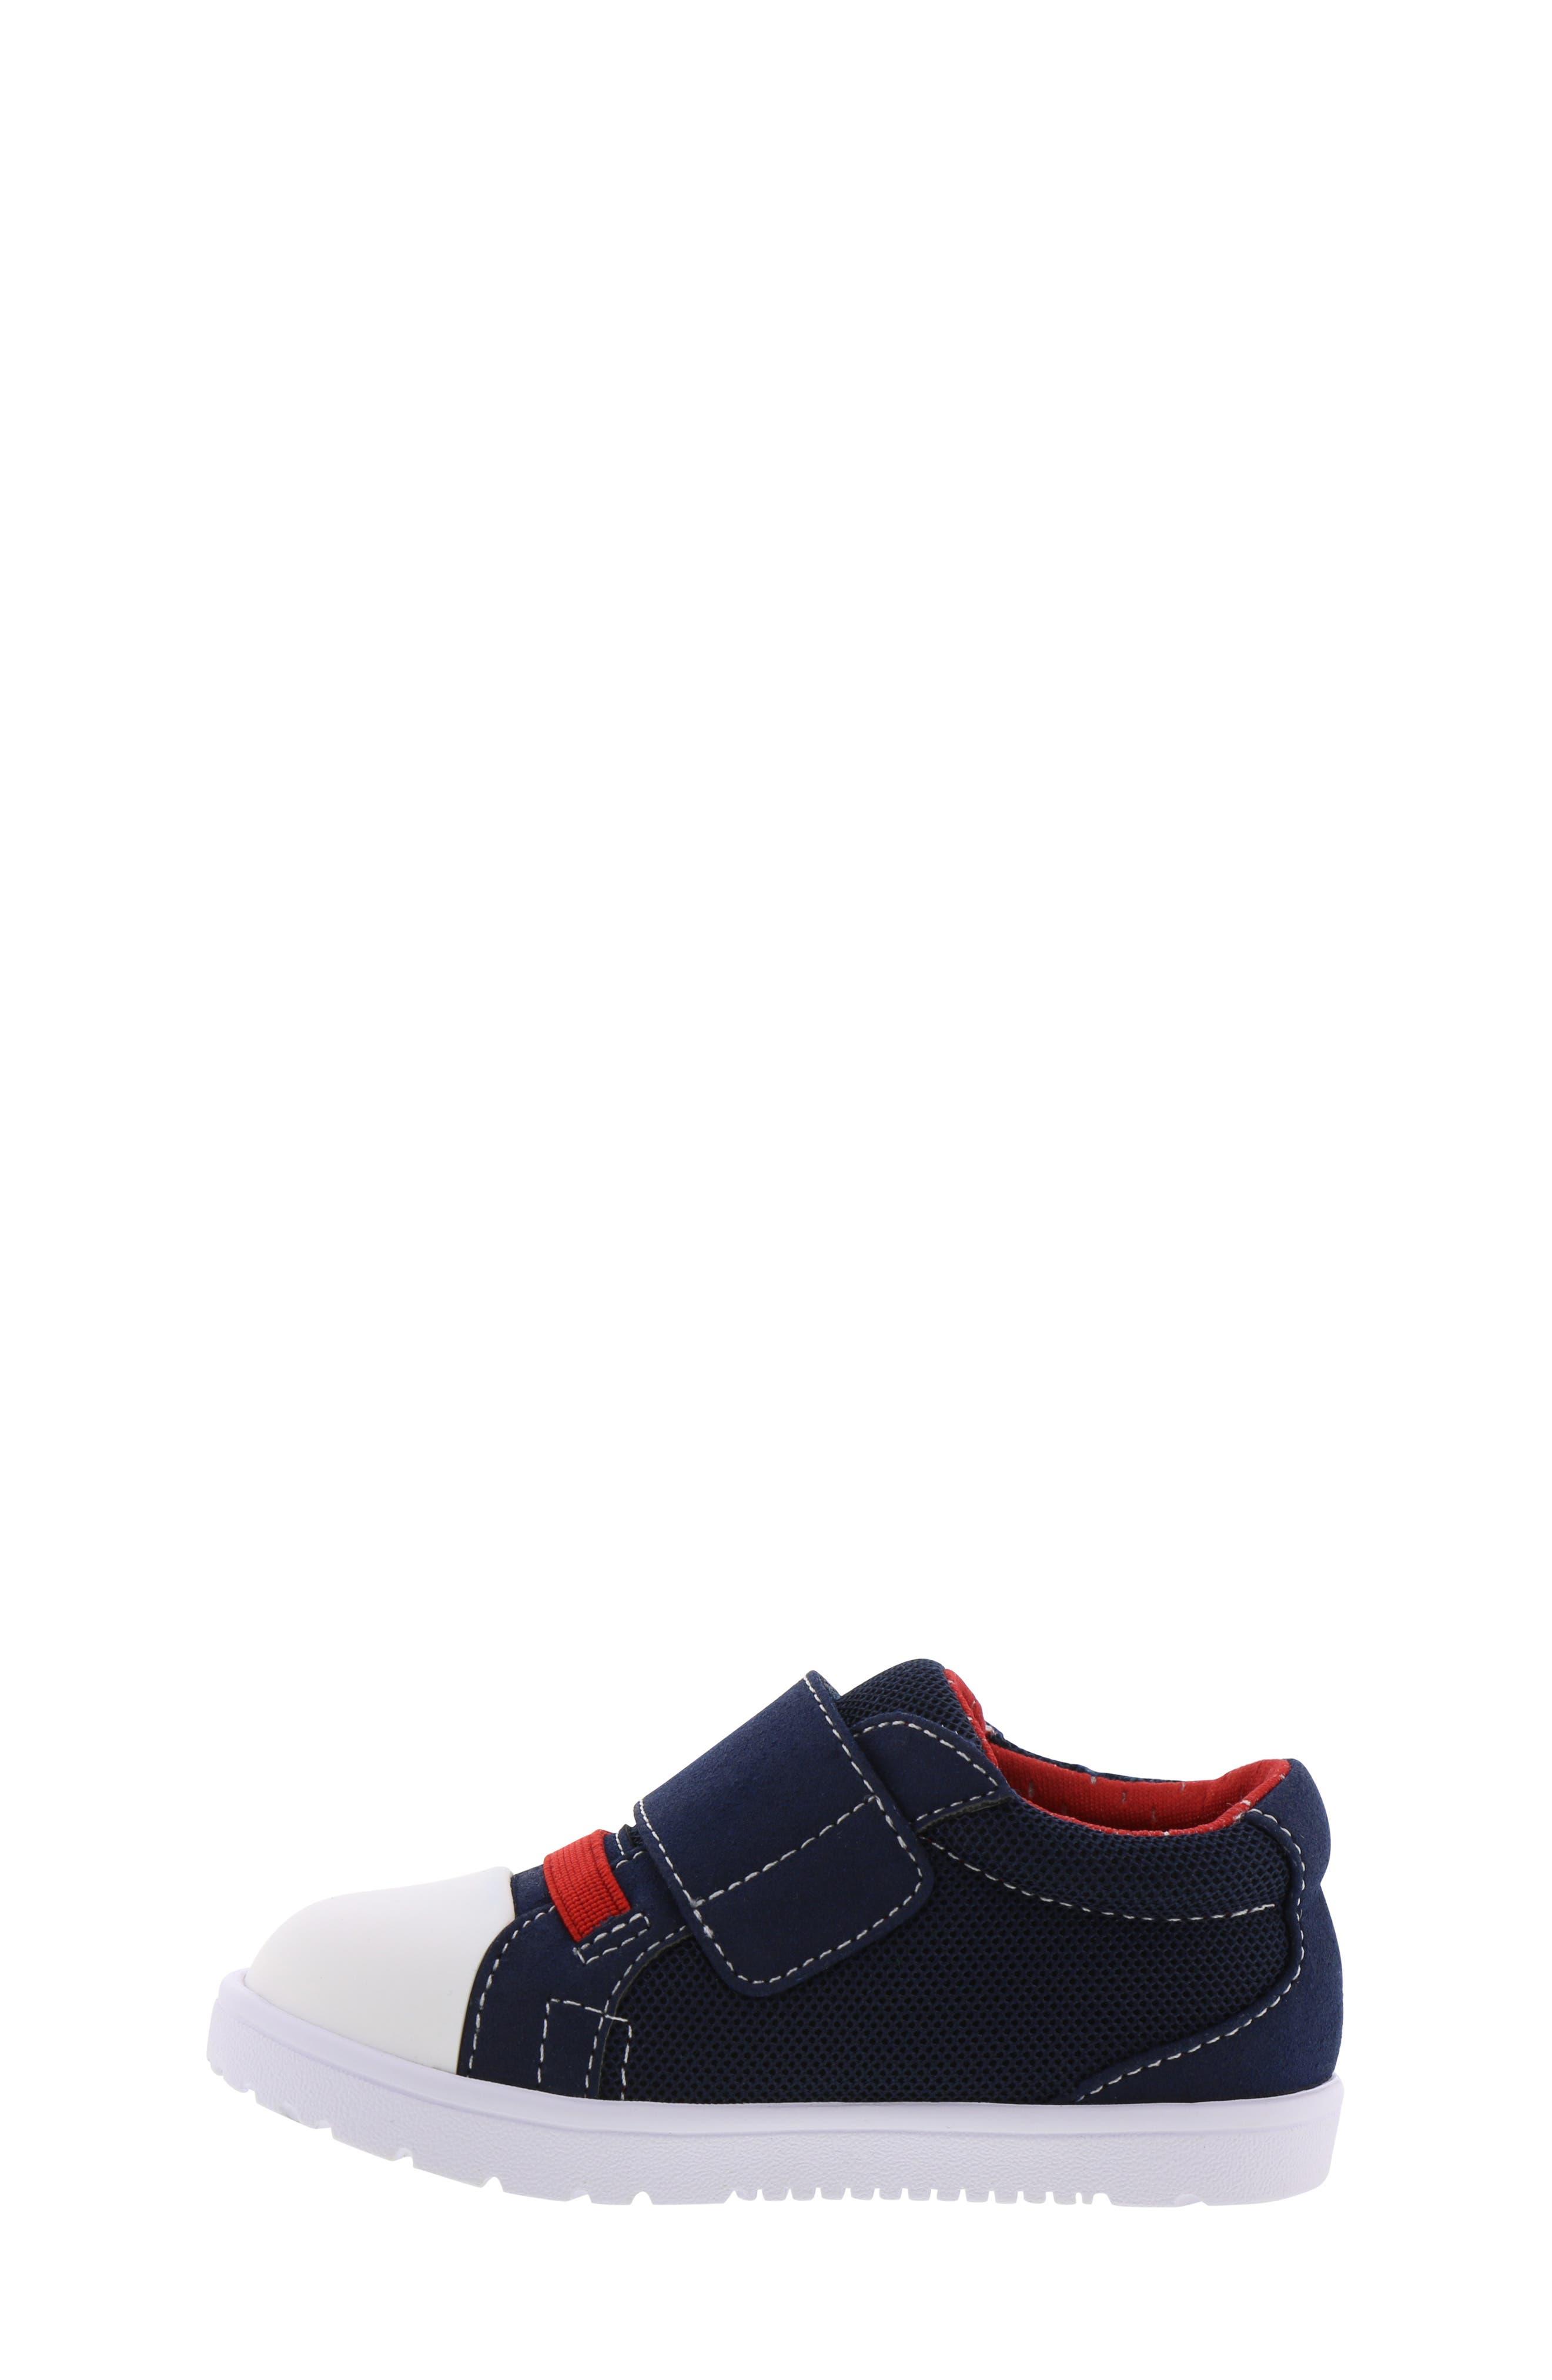 BØRN,                             Bailey Clark Sneaker,                             Alternate thumbnail 8, color,                             NAVY